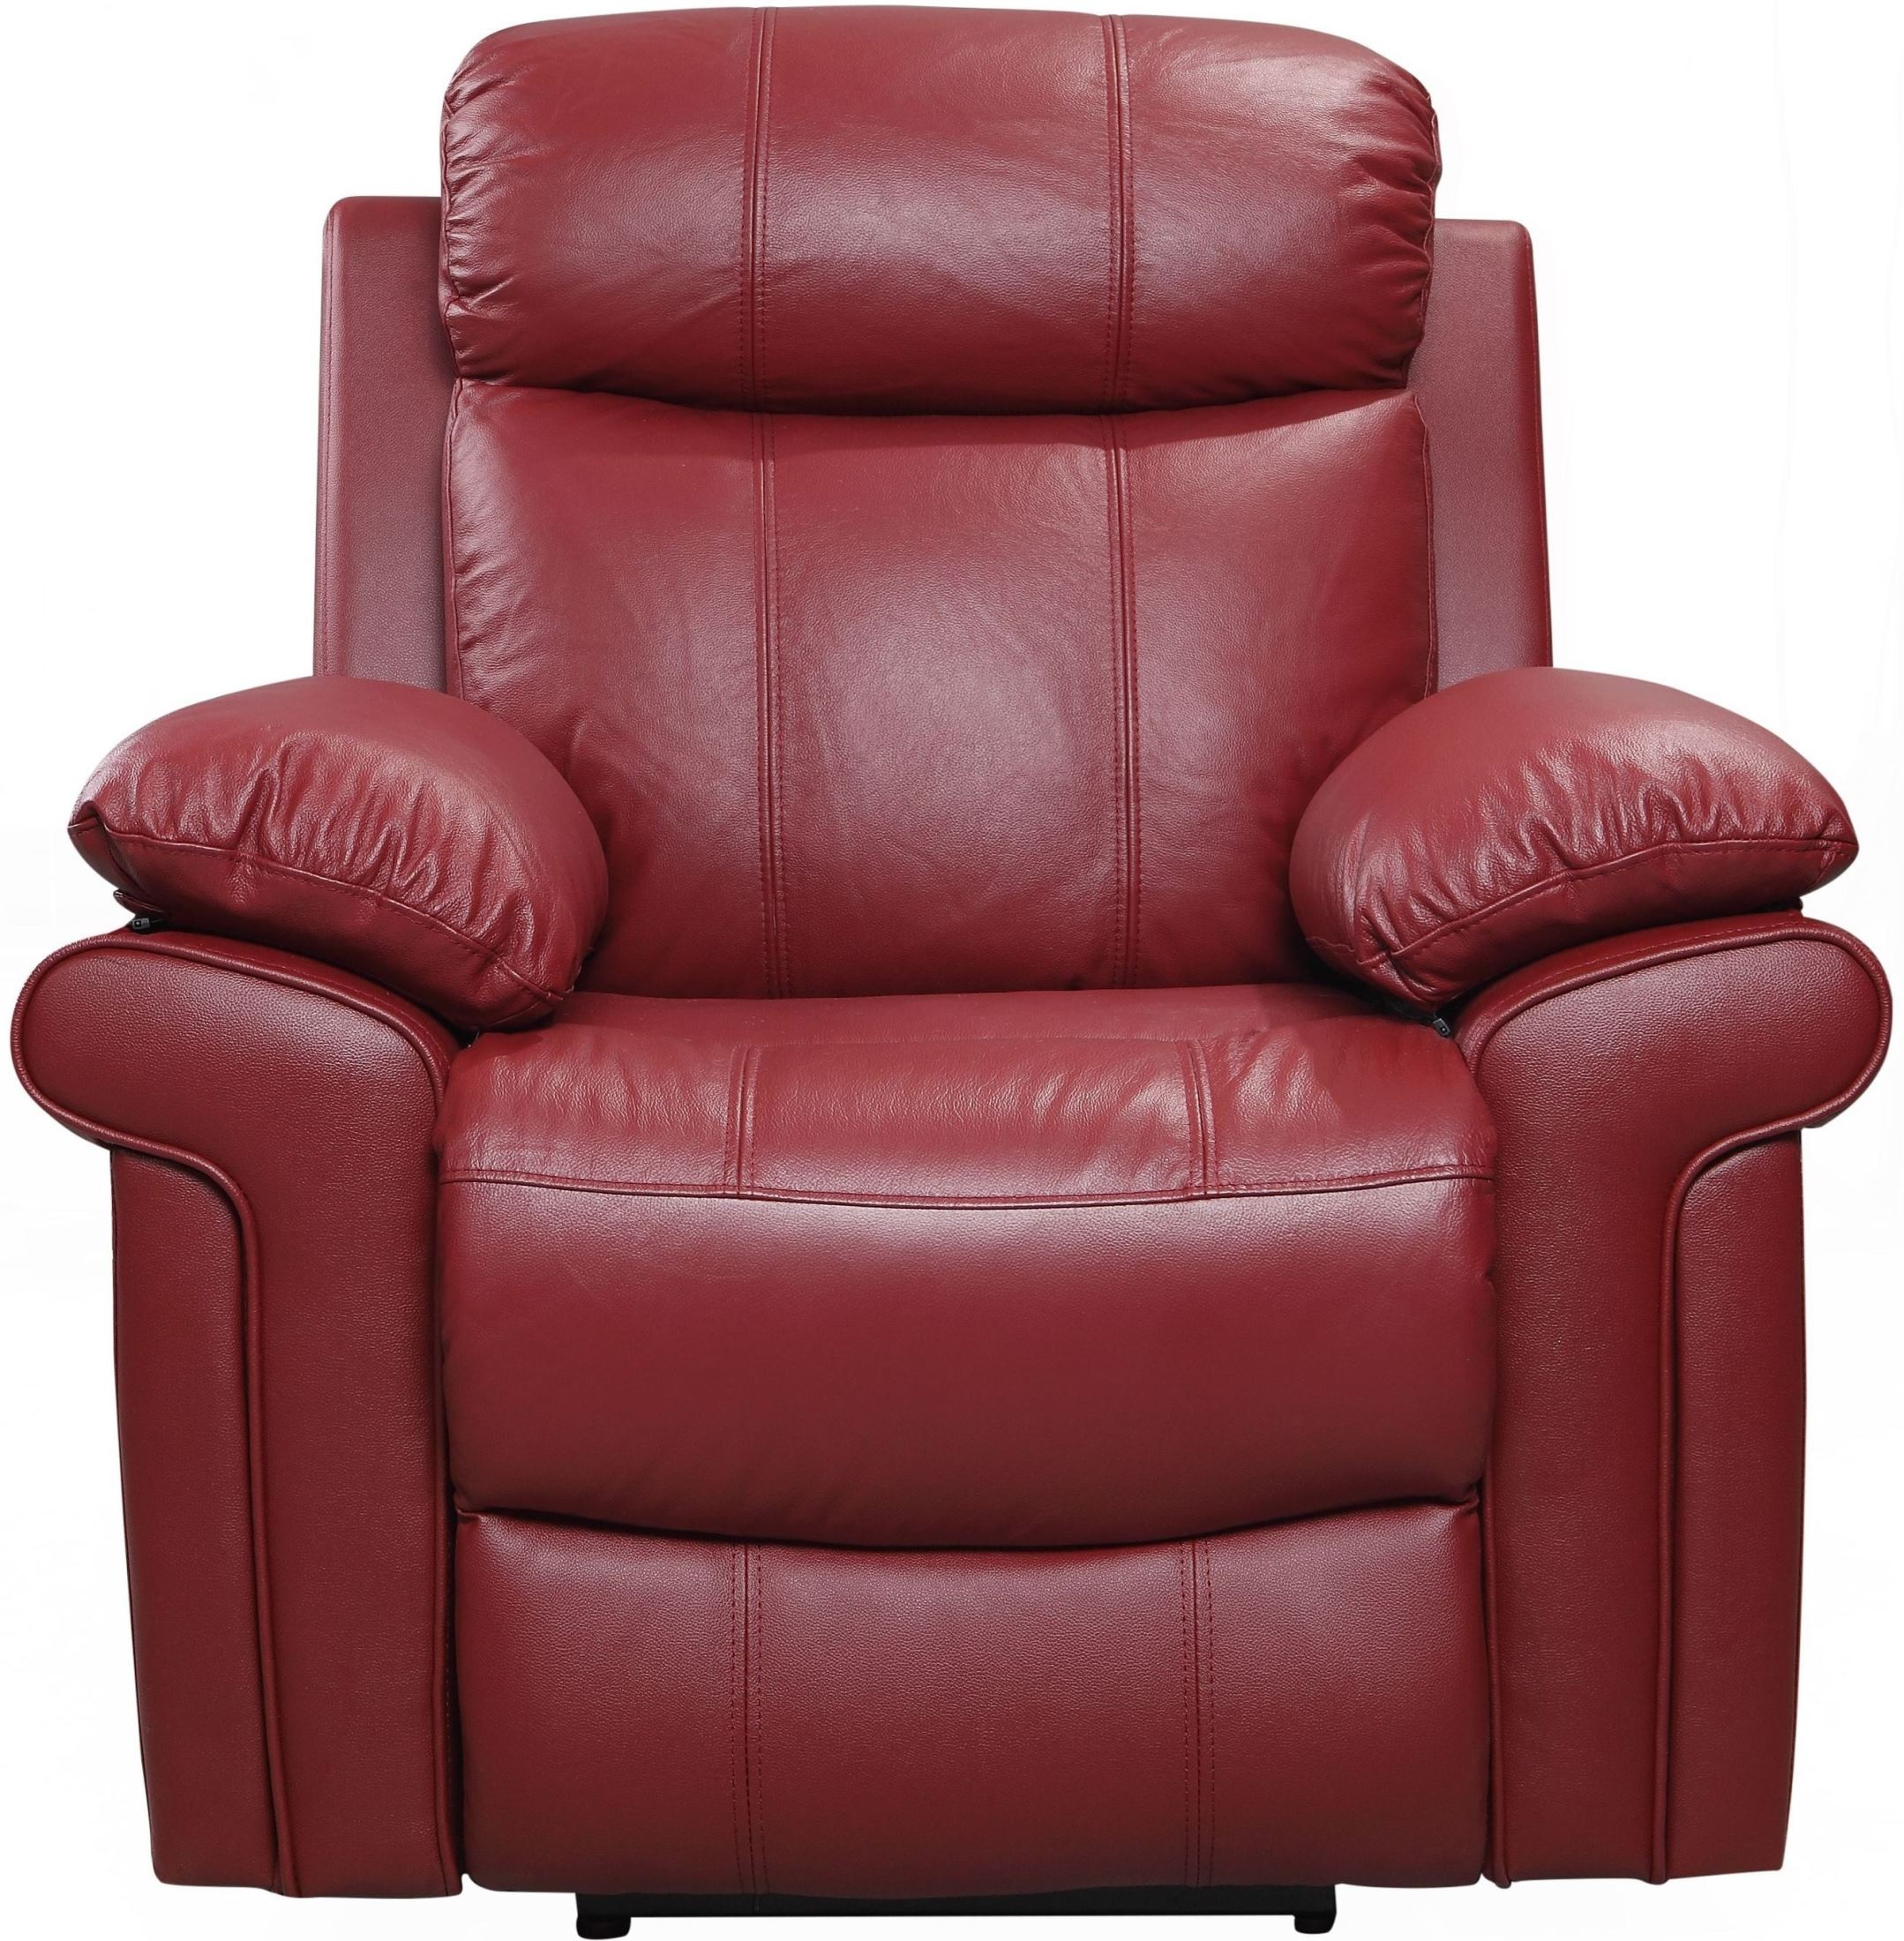 Shae Joplin Red Leather Power Reclining Sofa 1555 E2117